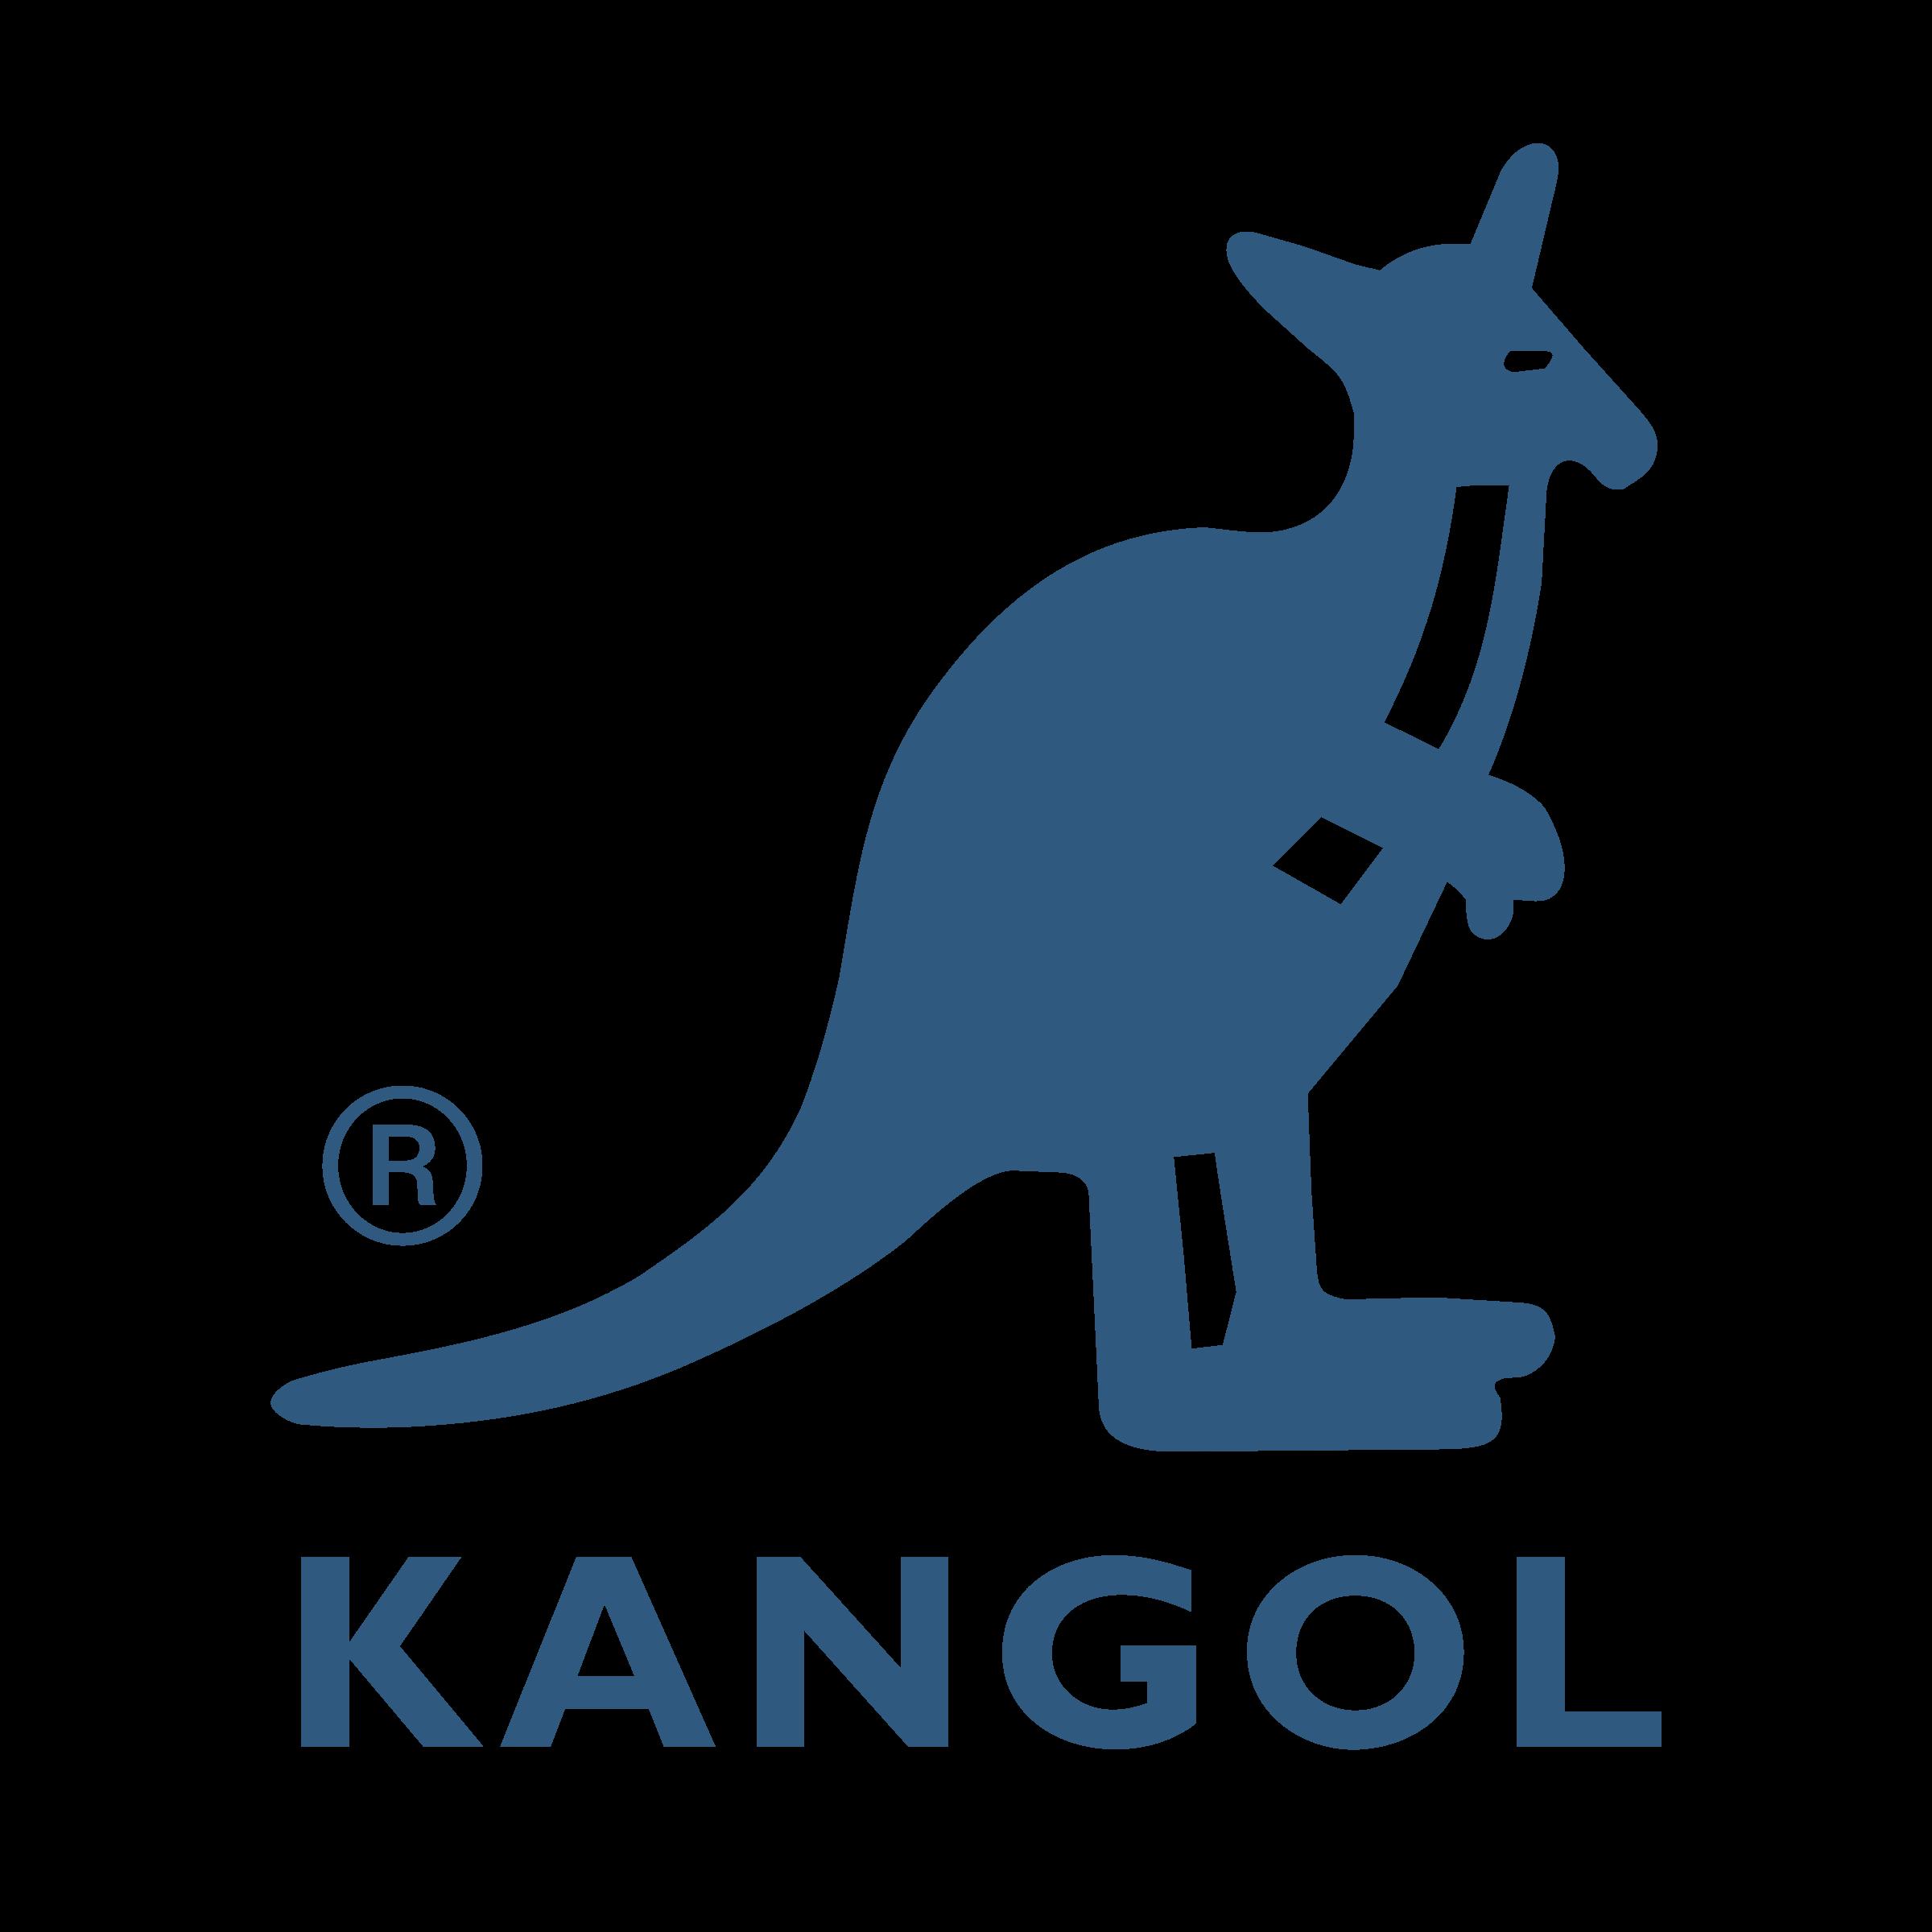 Kangol Logo Png Transparent Svg Vector Freebie Supply